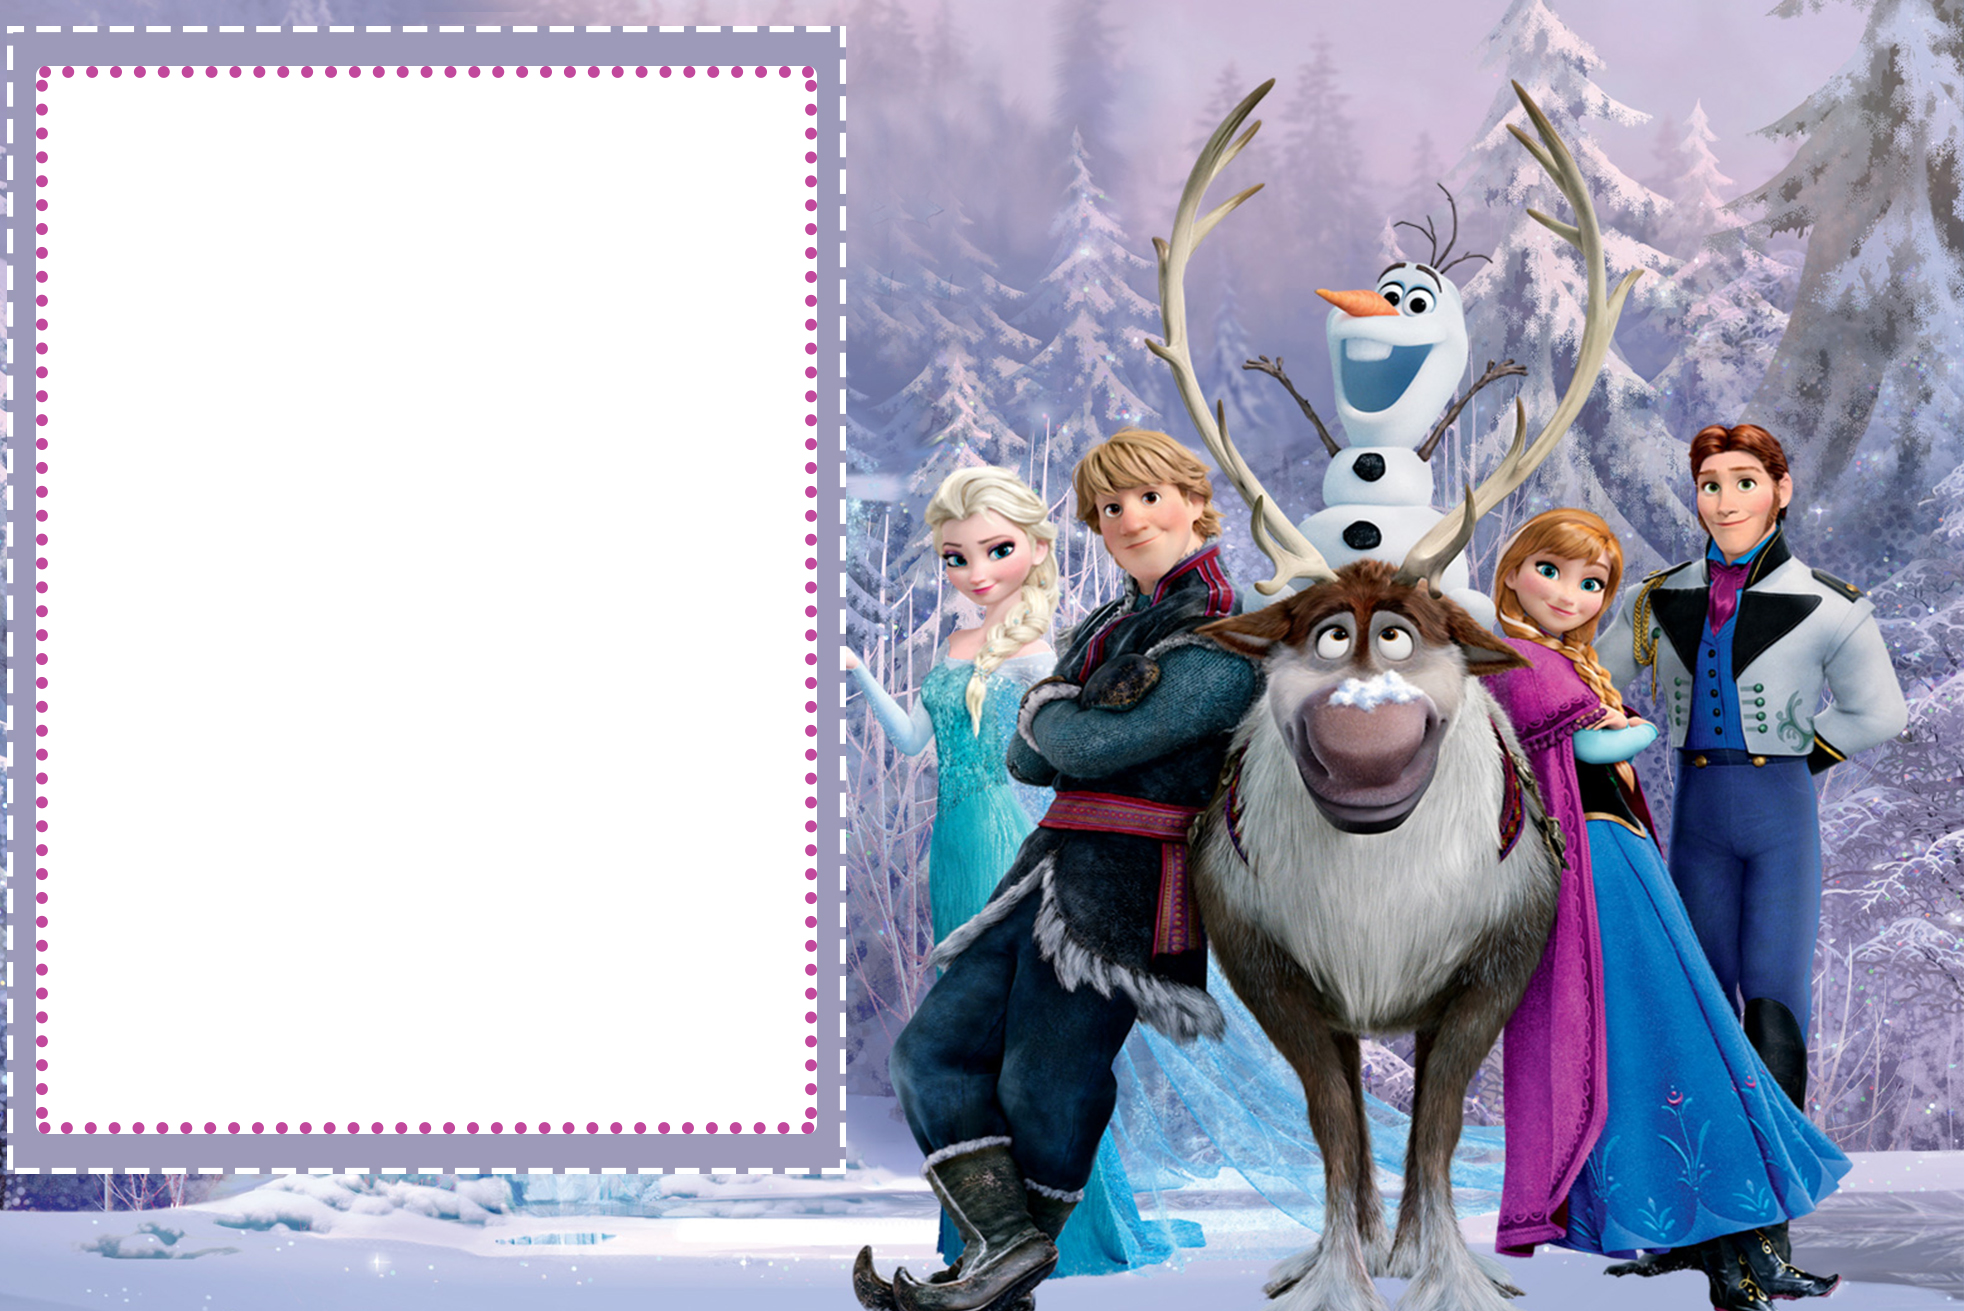 Imagens Frozen Uma Aventura Congelante Classy kit completo frozen disney - uma aventura congelante!